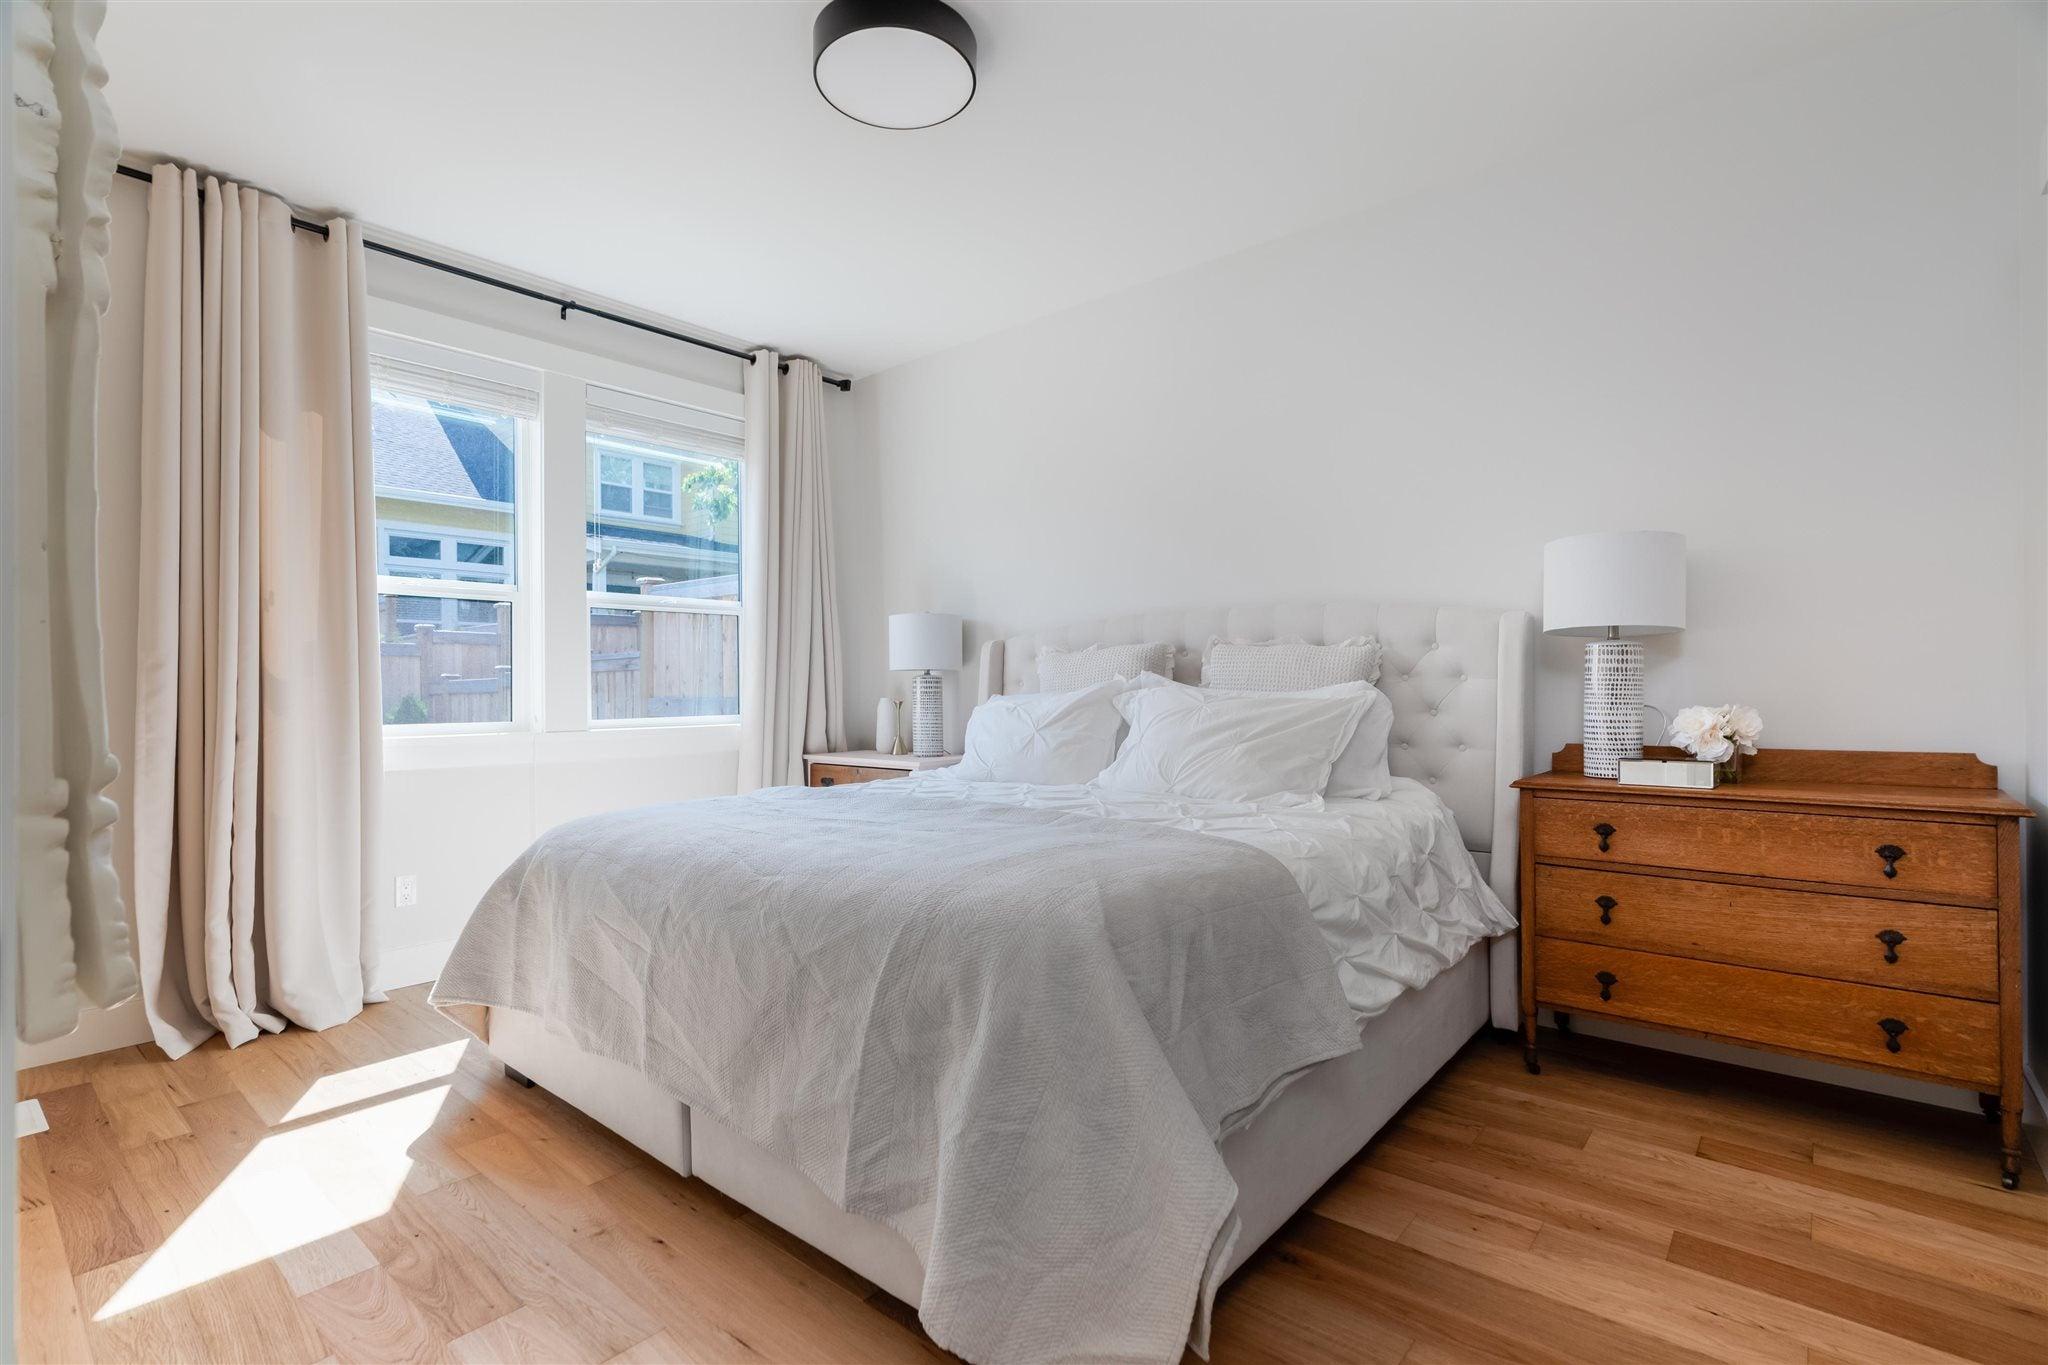 40 21858 47B AVENUE - Murrayville Townhouse for sale, 4 Bedrooms (R2603956) - #14